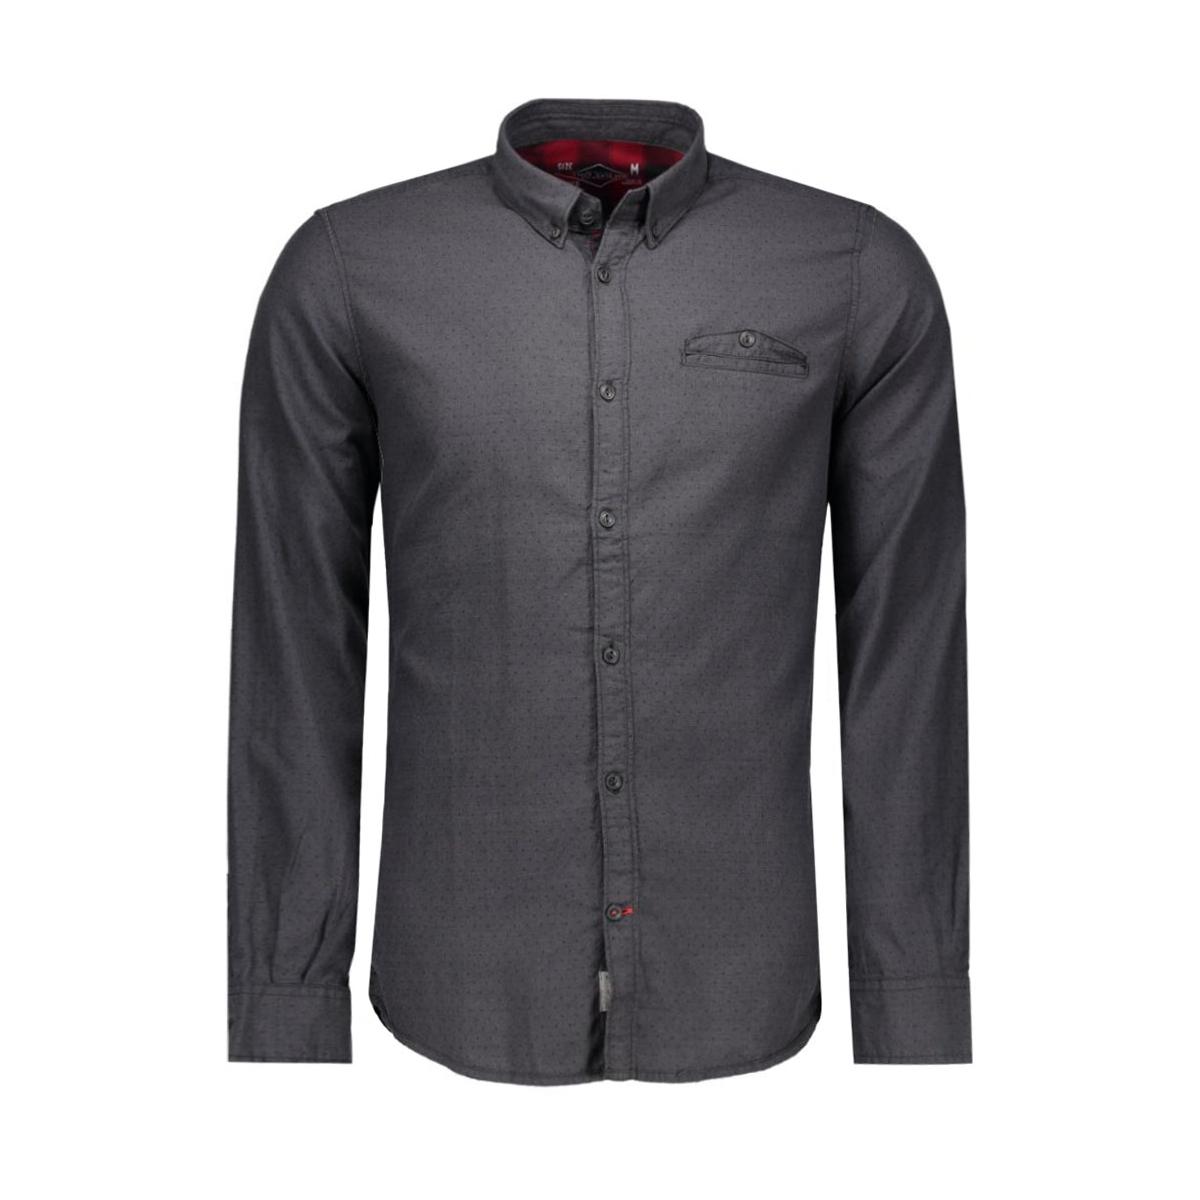 2032564.62.10 tom tailor overhemd 2999